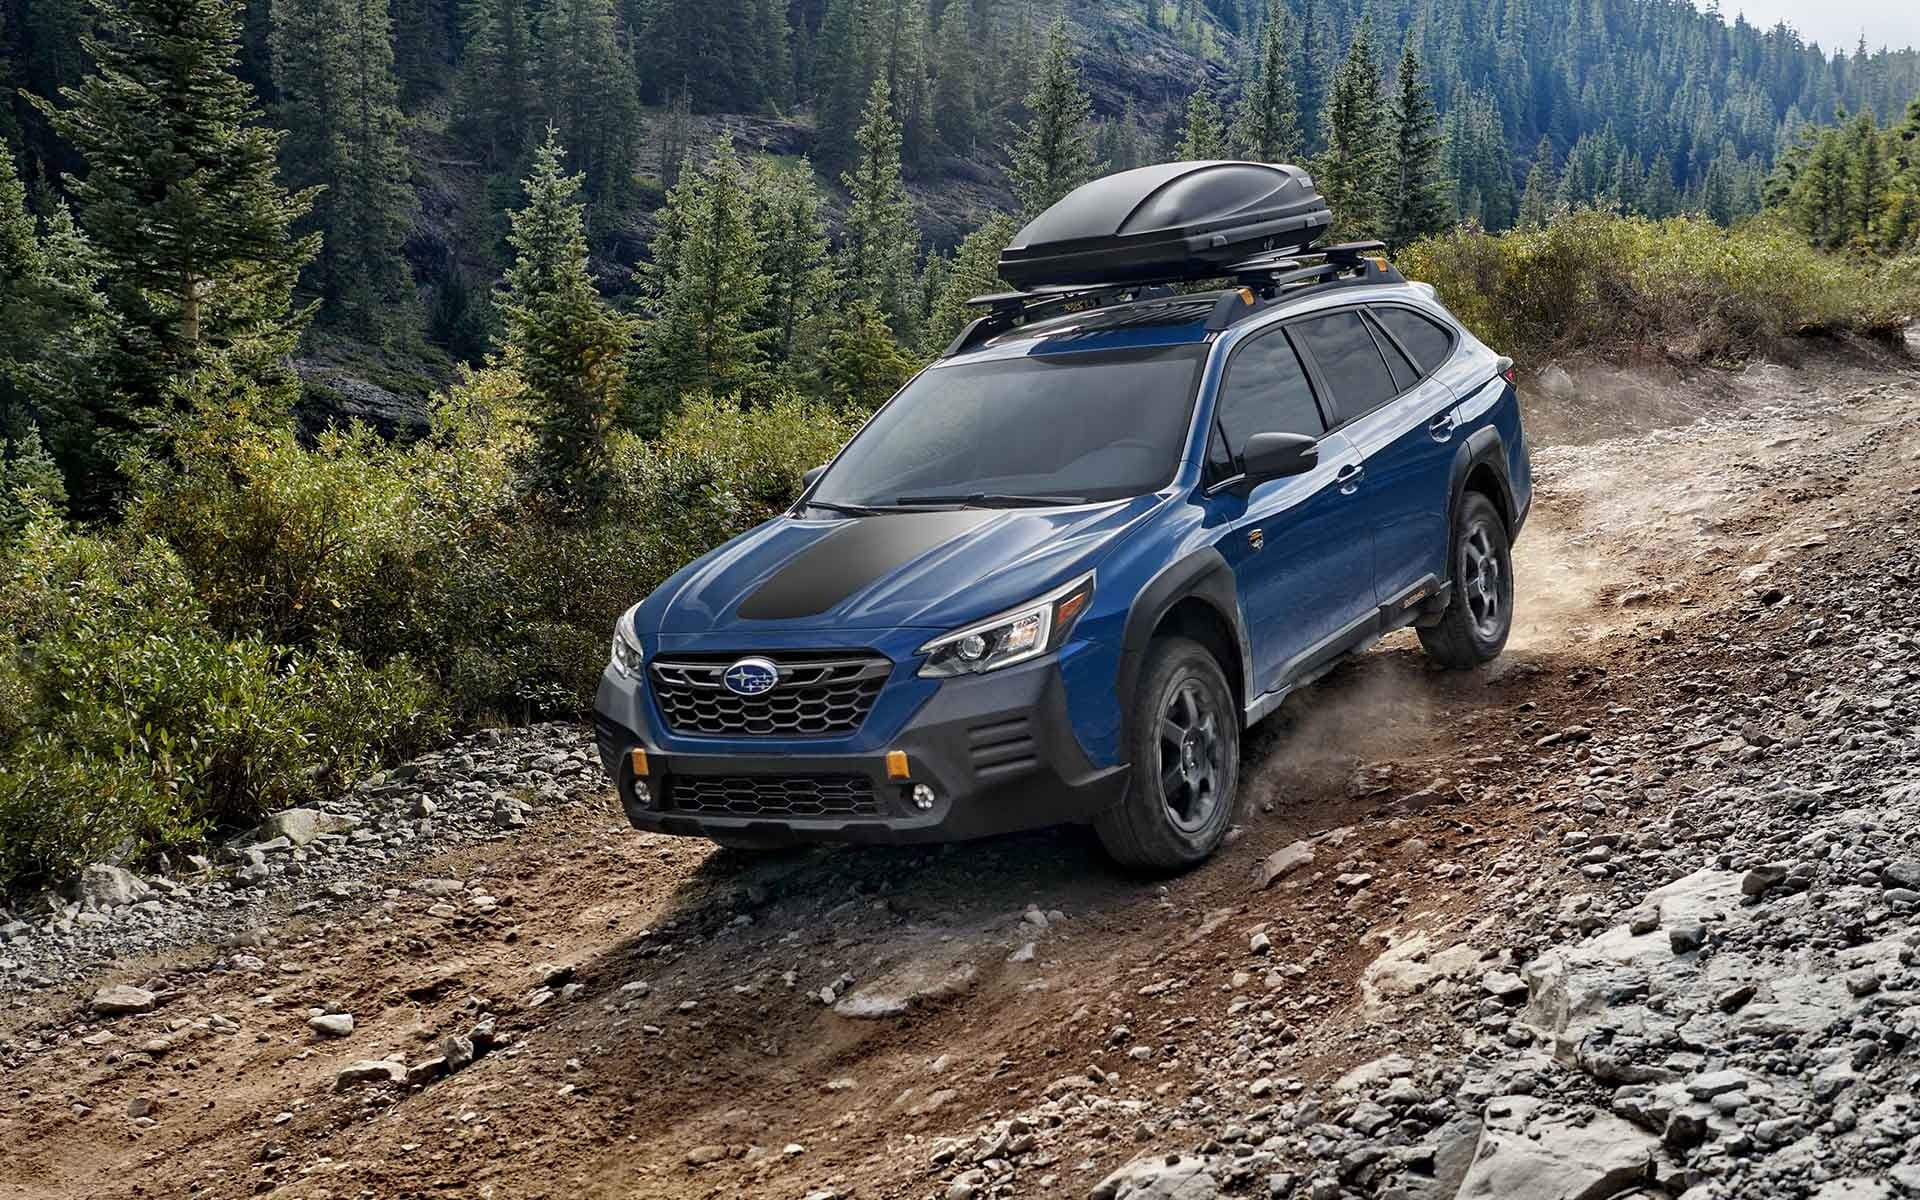 2022 Subaru Outback Wilderness Ramsey NJ